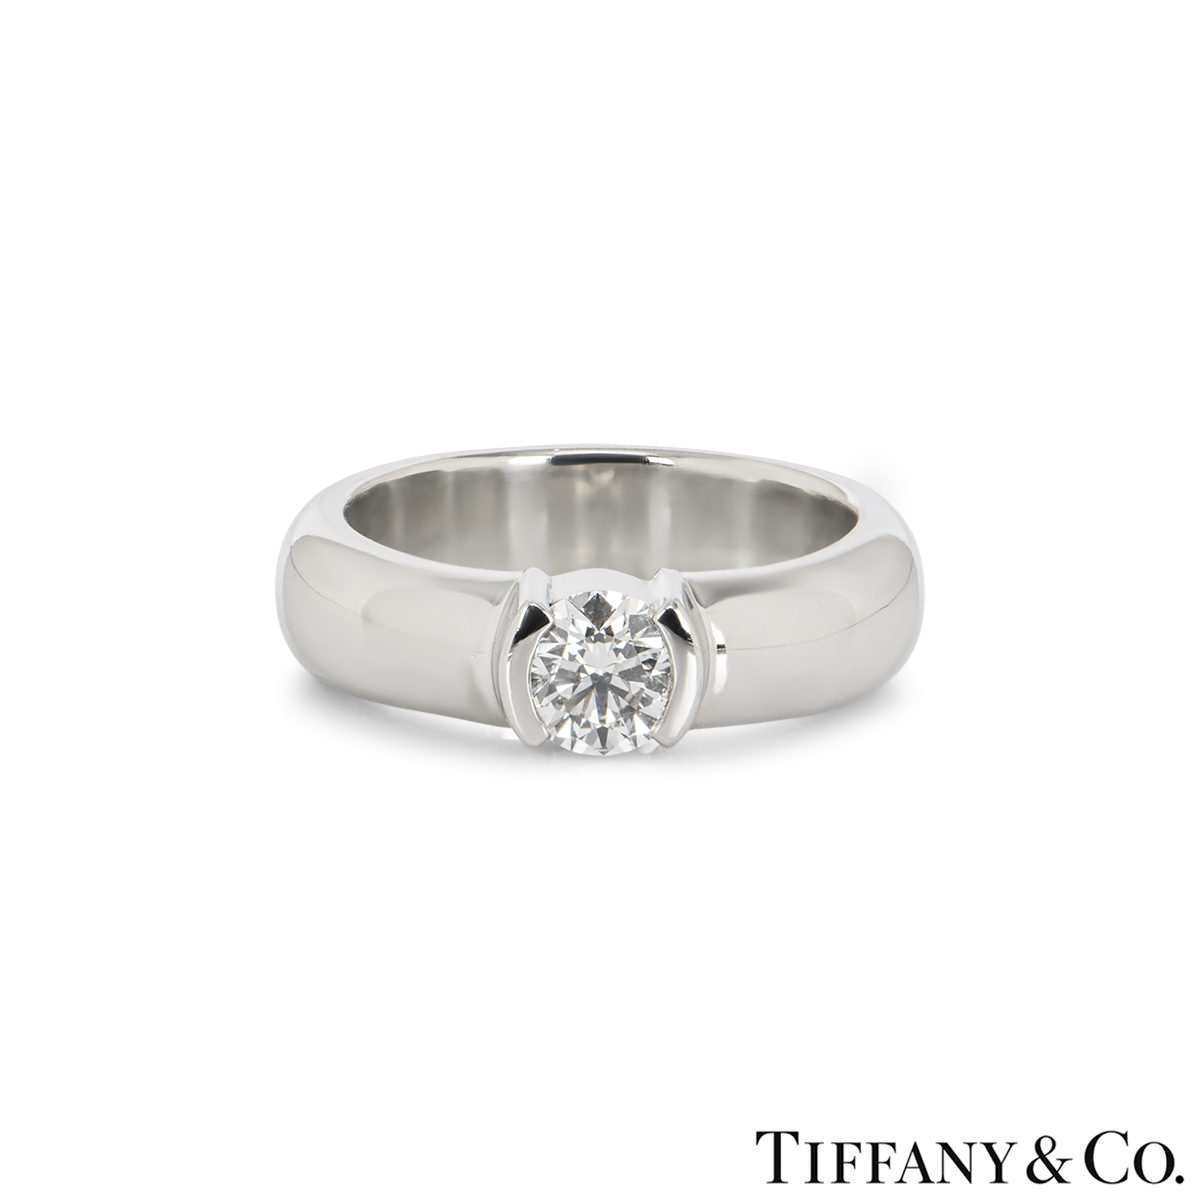 tiffany co diamond etoile platinum ring f vs1. Black Bedroom Furniture Sets. Home Design Ideas